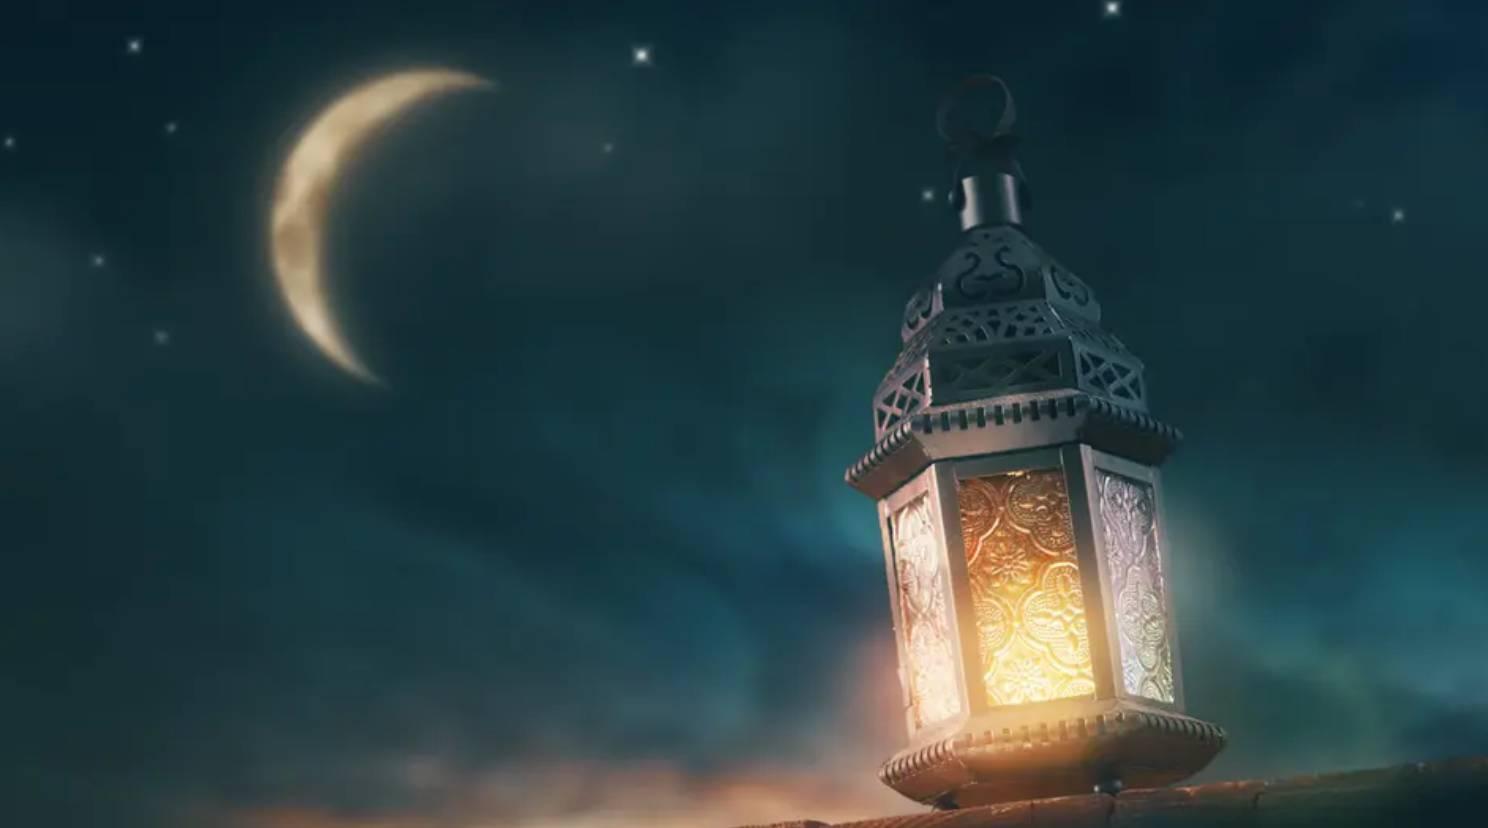 Ramadan 30 days: Majmaah Observatory